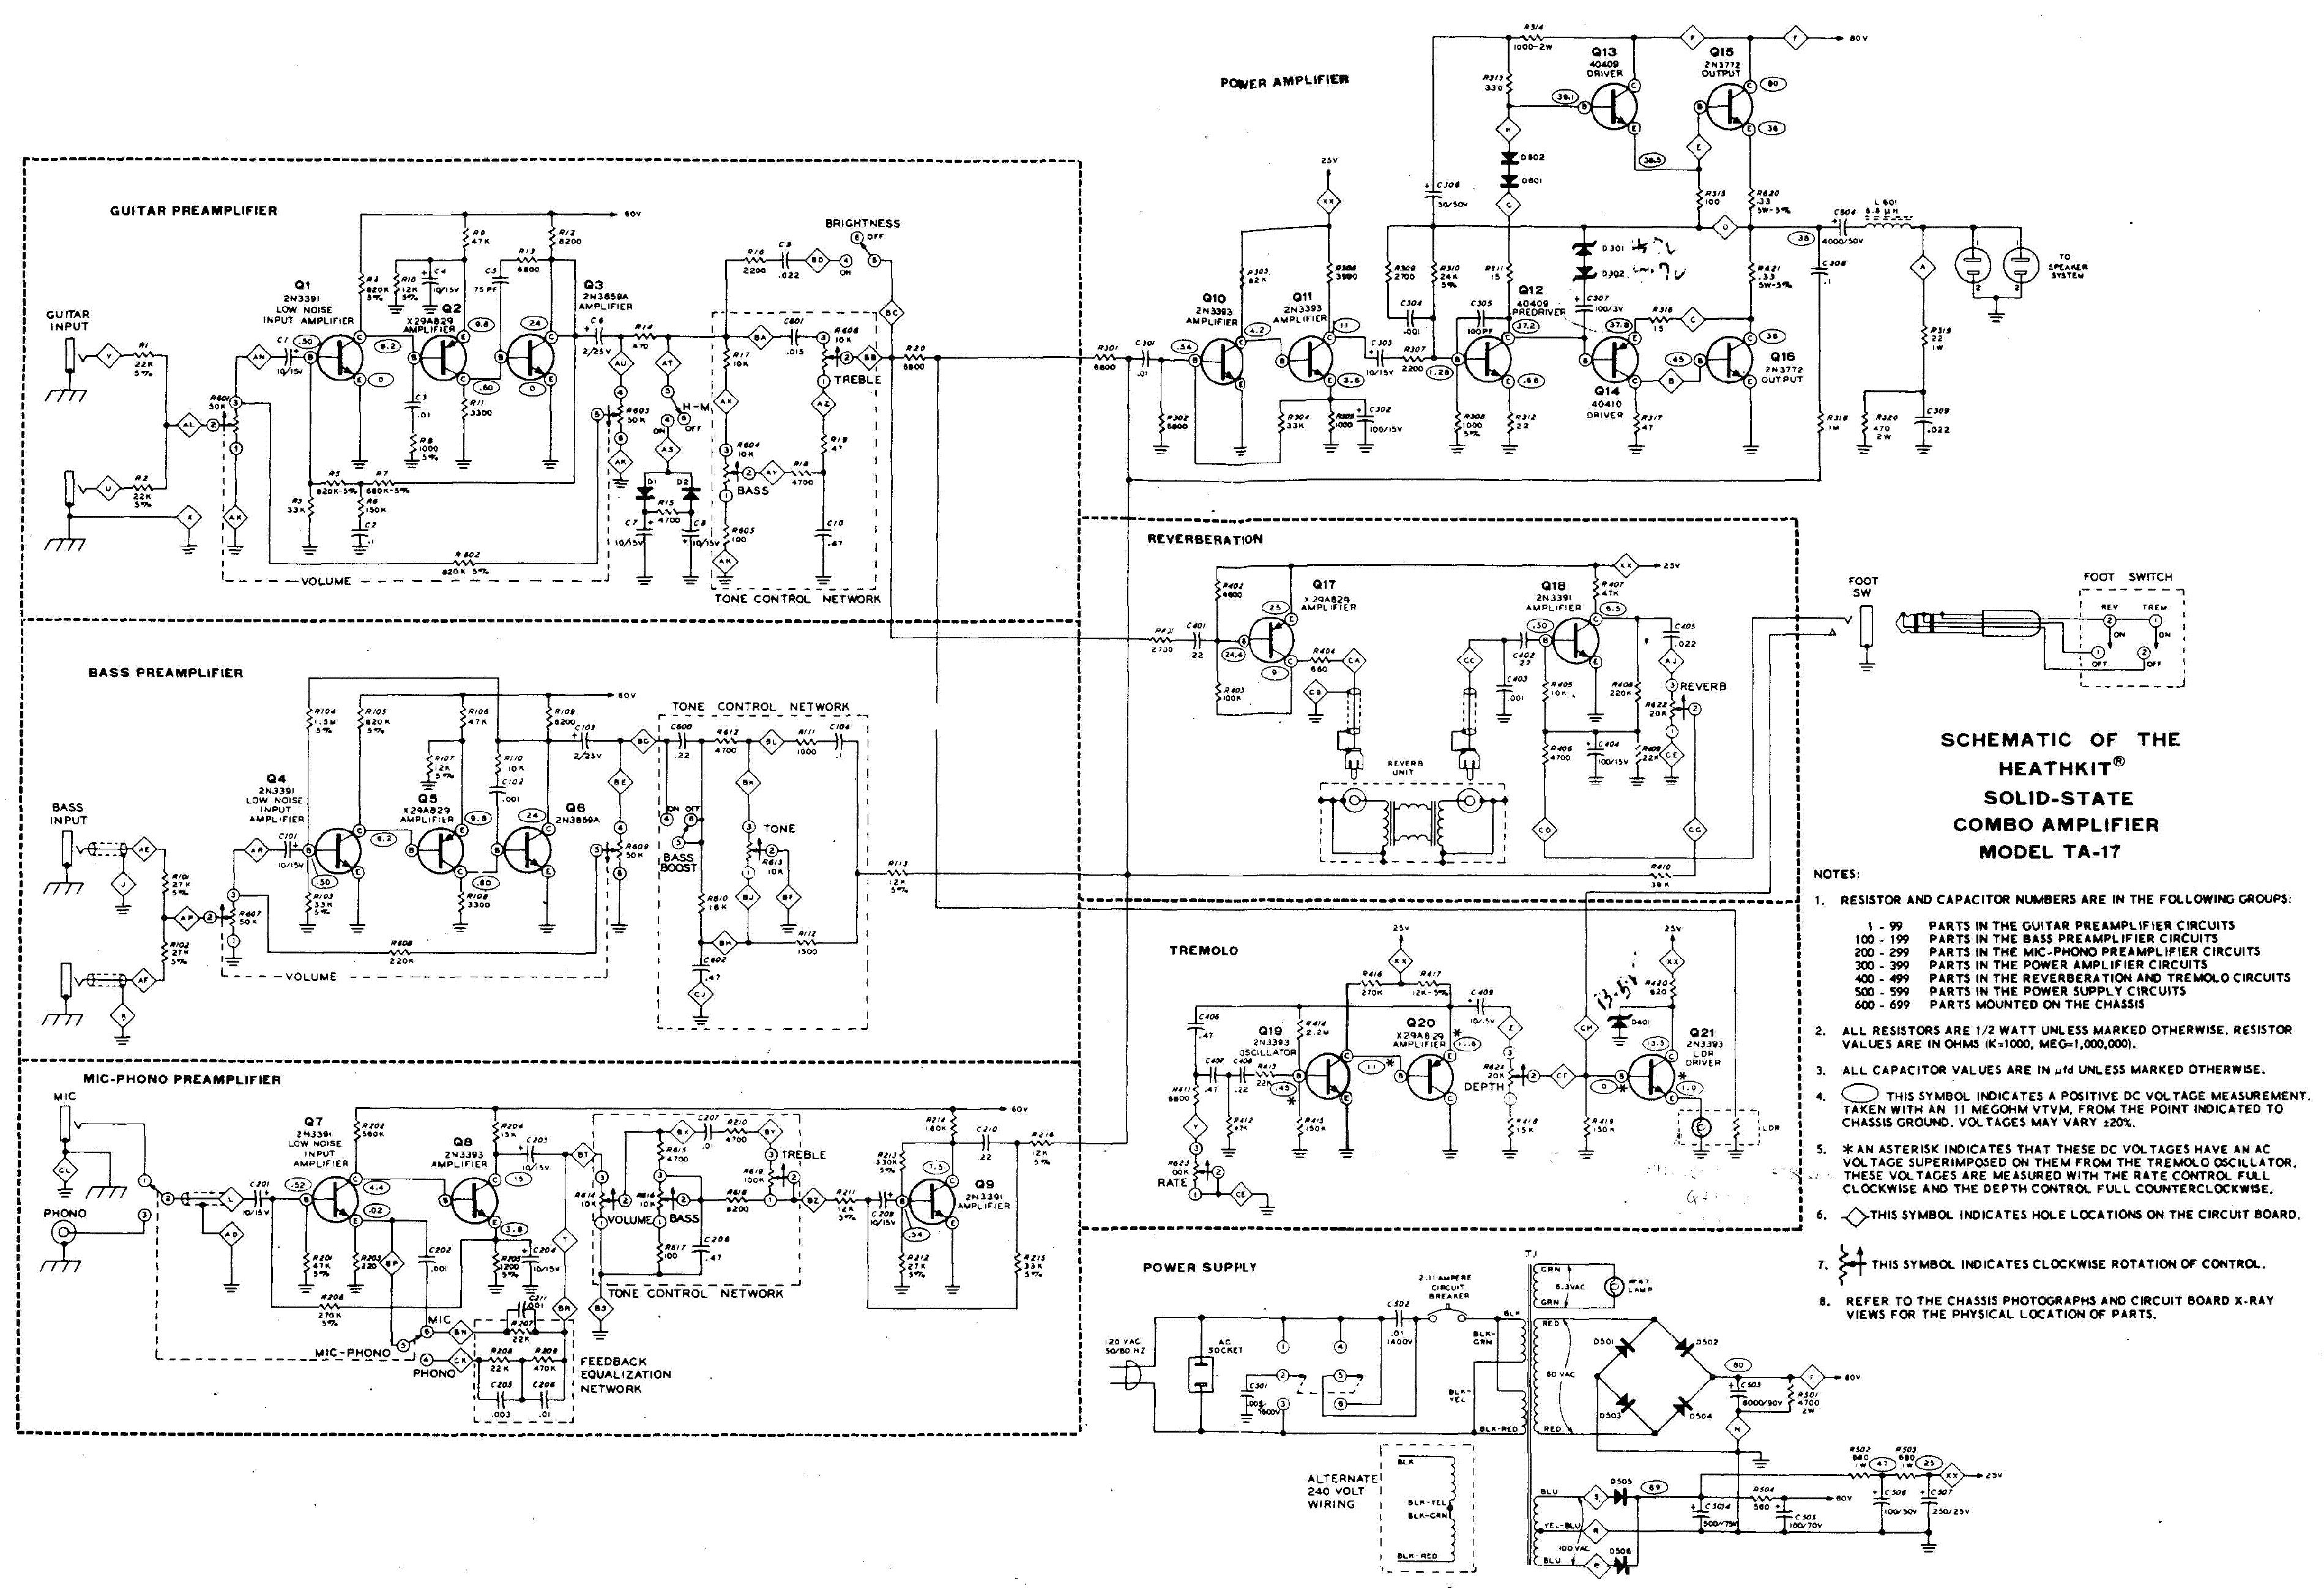 heathkit ta 16 schematics